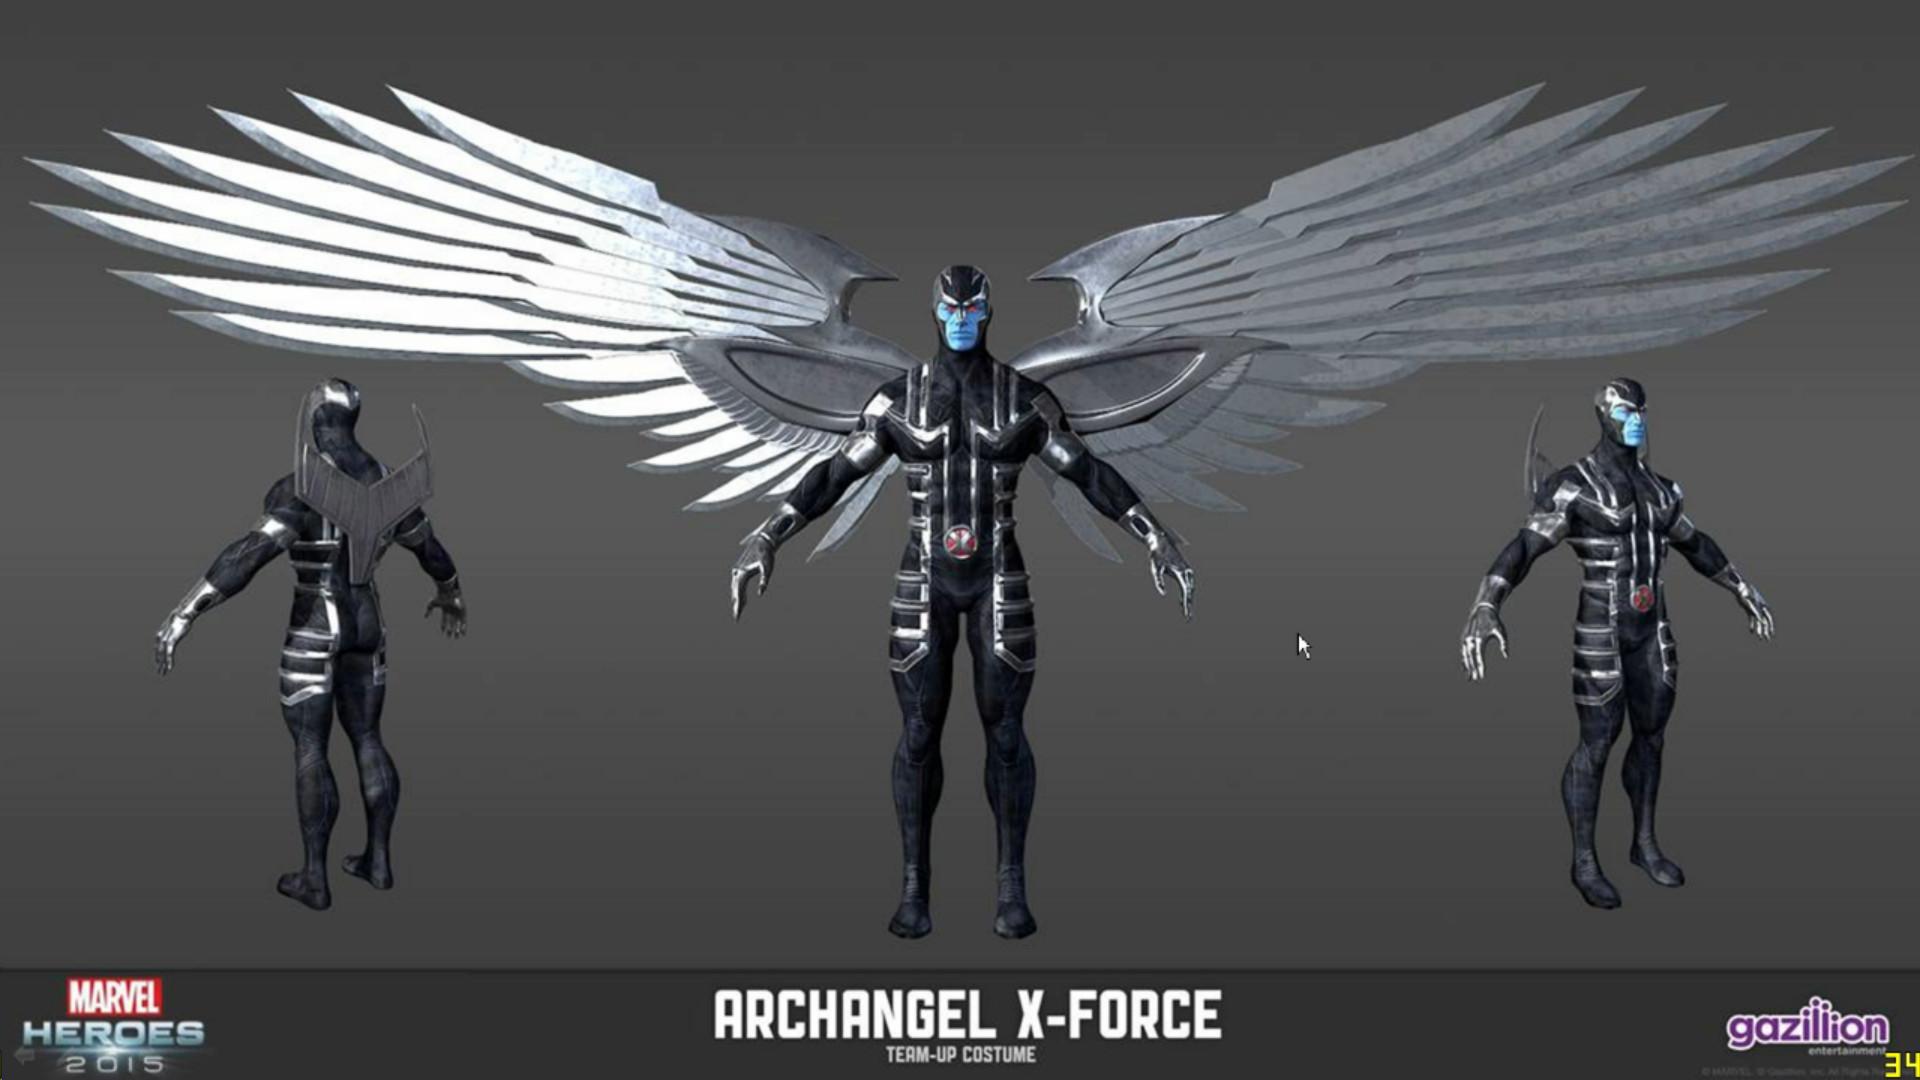 Must see Wallpaper Marvel Archangel - 386600  Graphic_93861.jpg